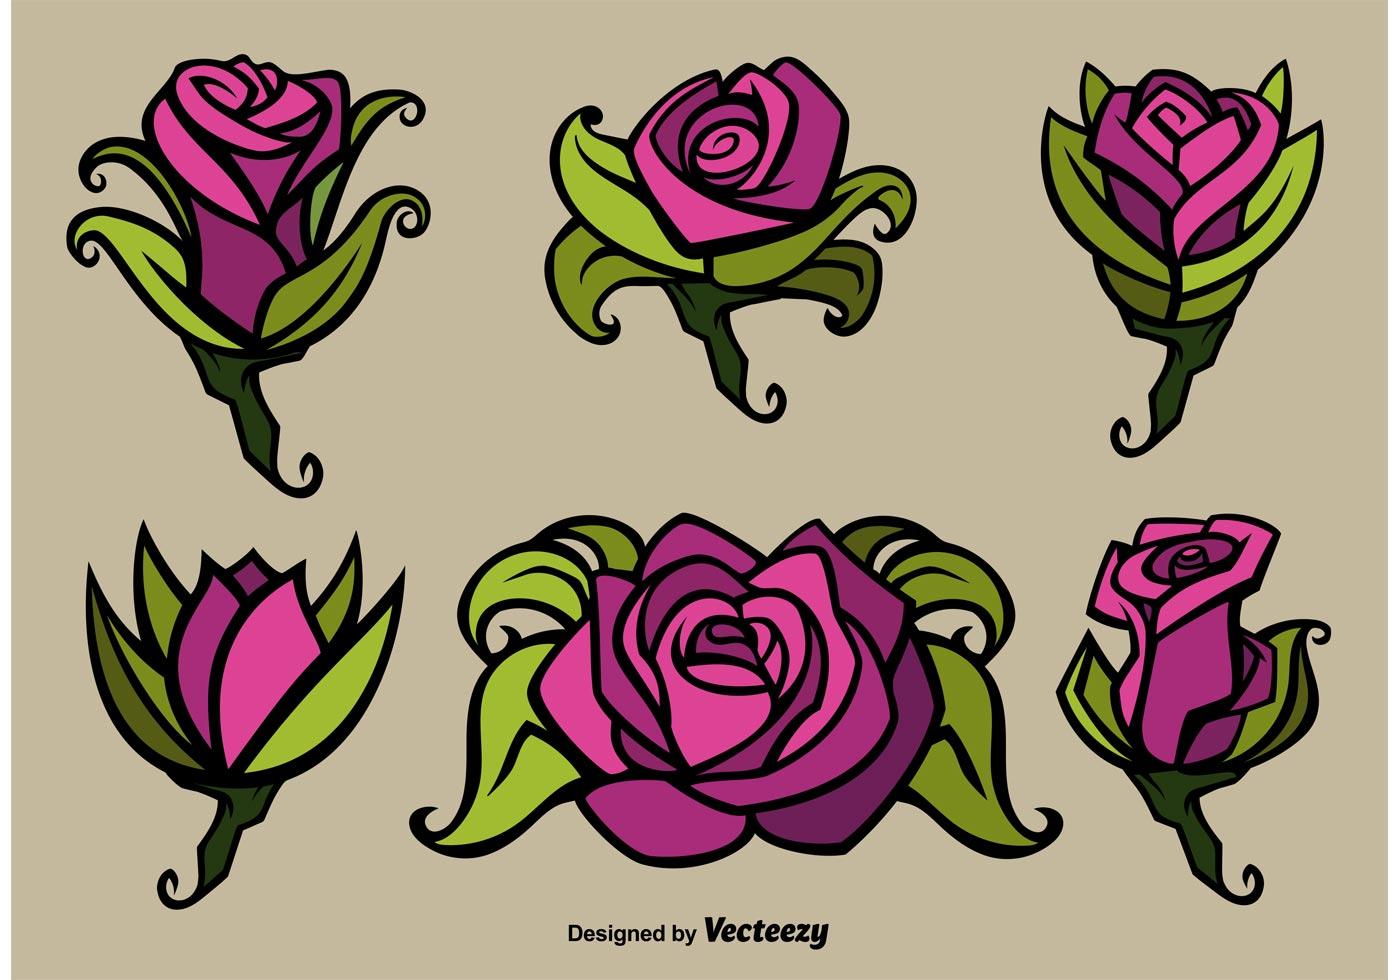 Rose Flower Vector Illustrations - Download Free Vector ...  Rose Flower Vec...